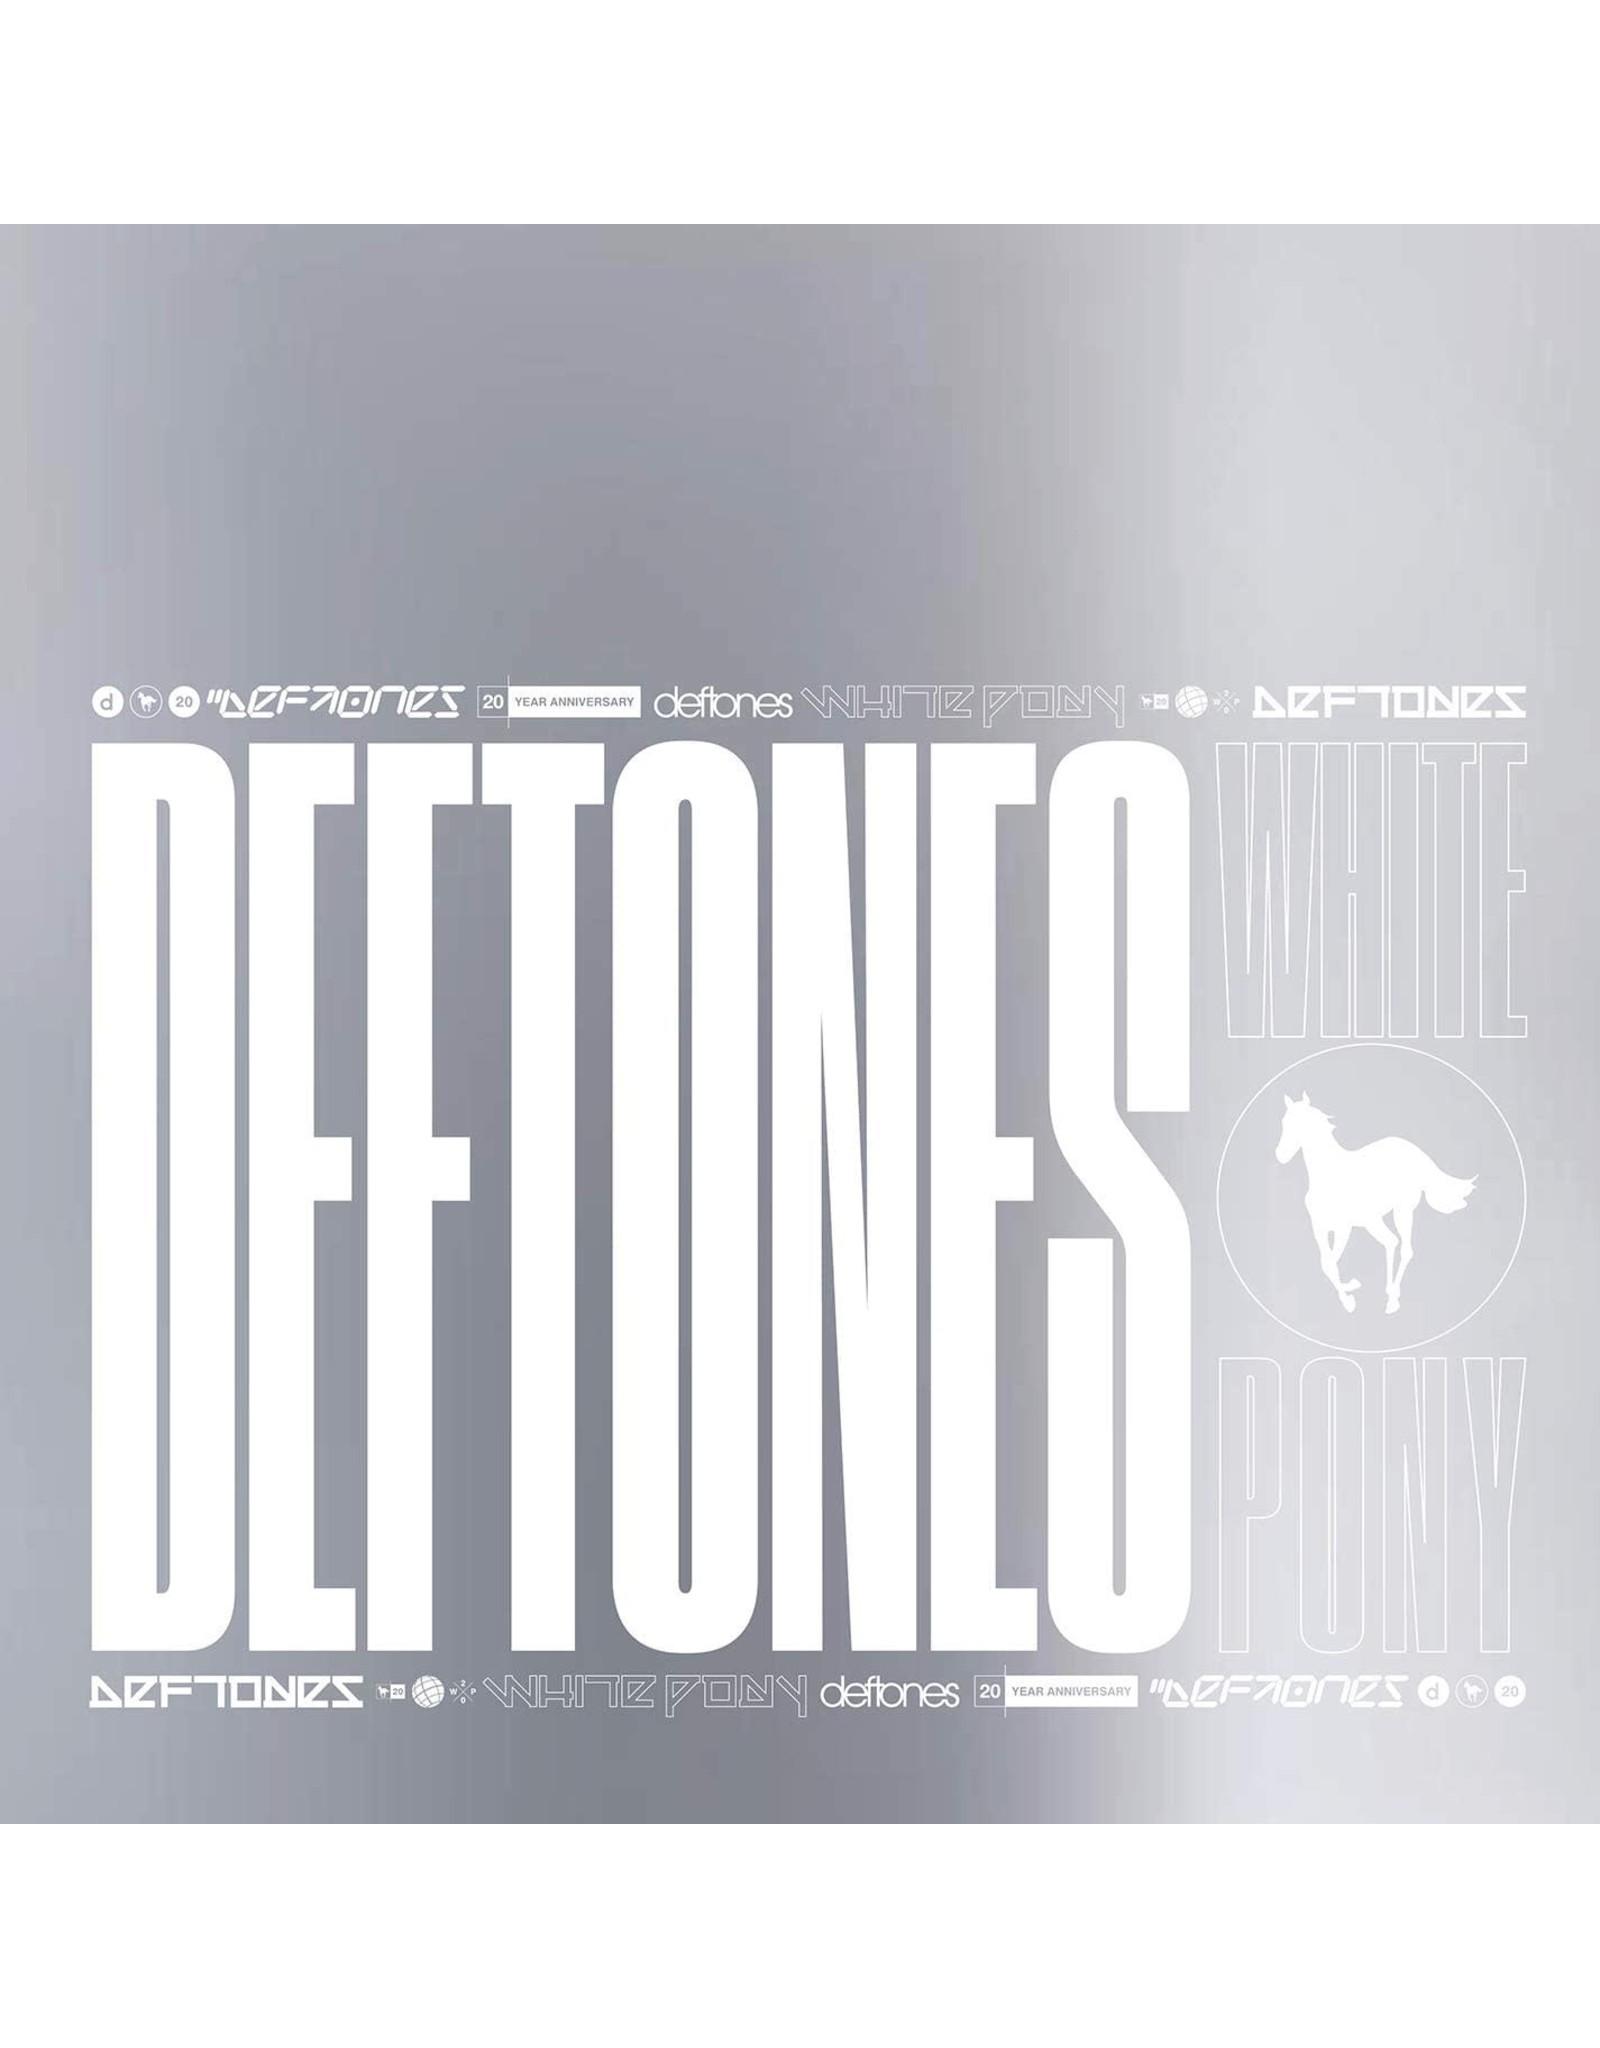 Deftones - White Pony (20th Anniversary Deluxe Edition) 4LP/2CD